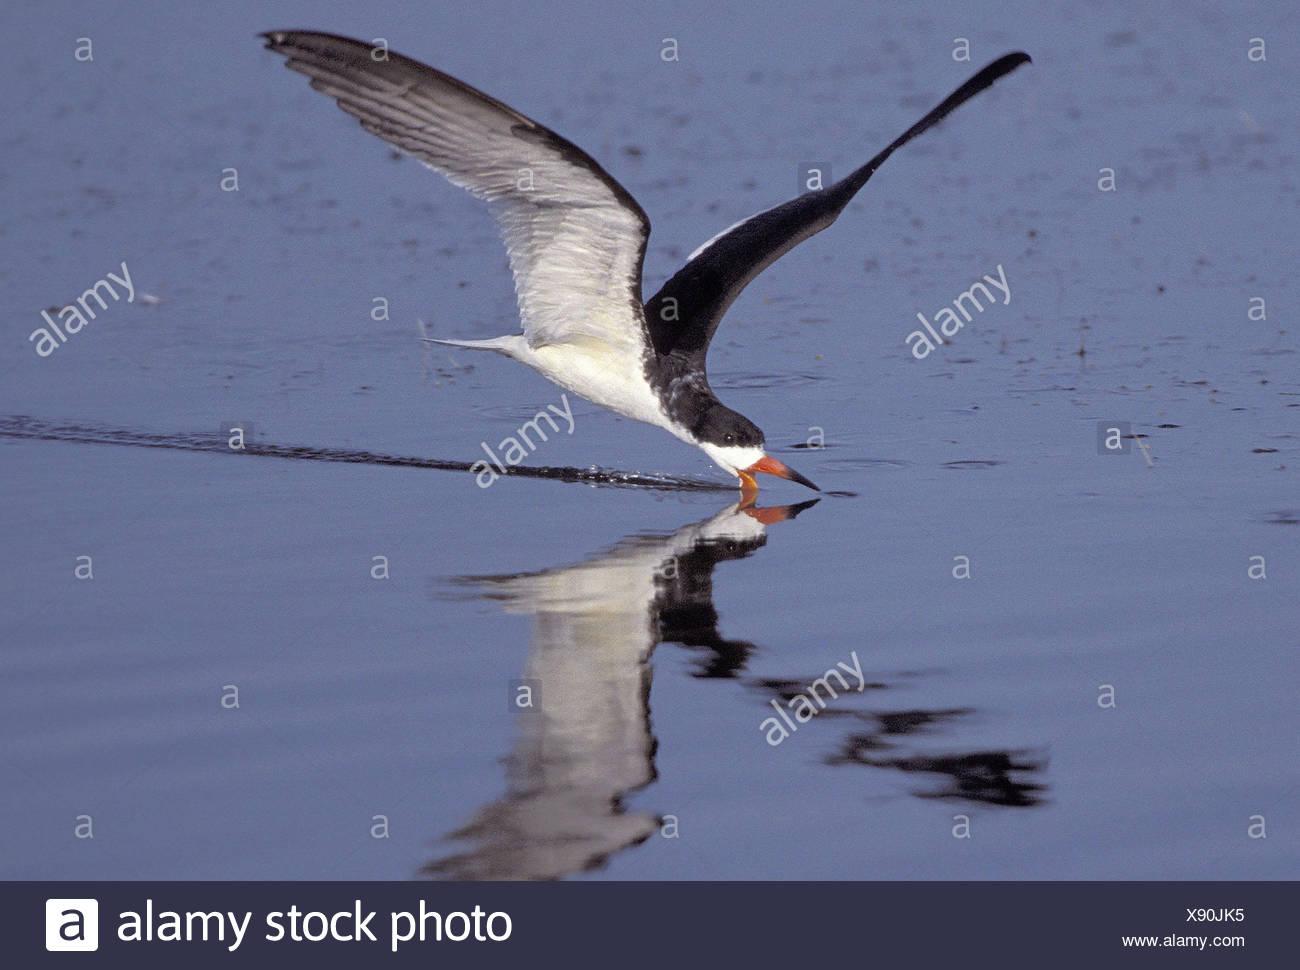 Bird Seabird Skimmer Stock Photos & Bird Seabird Skimmer